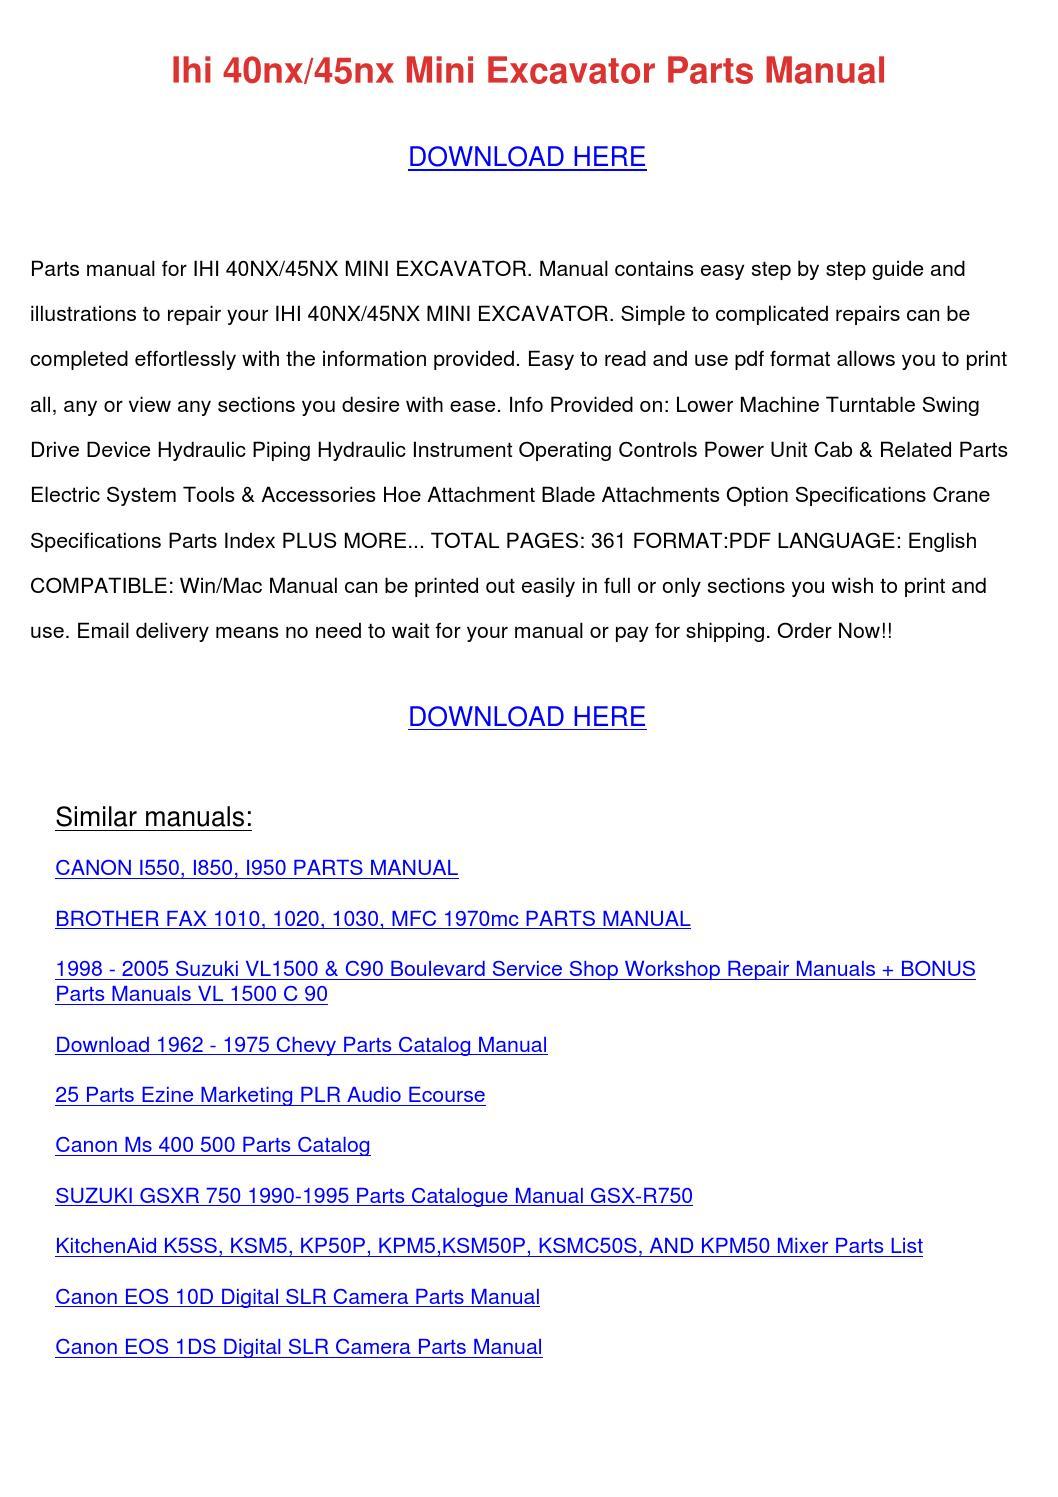 Ihi 40nx45nx Mini Excavator Parts Manual by DoyleCrist - issuu